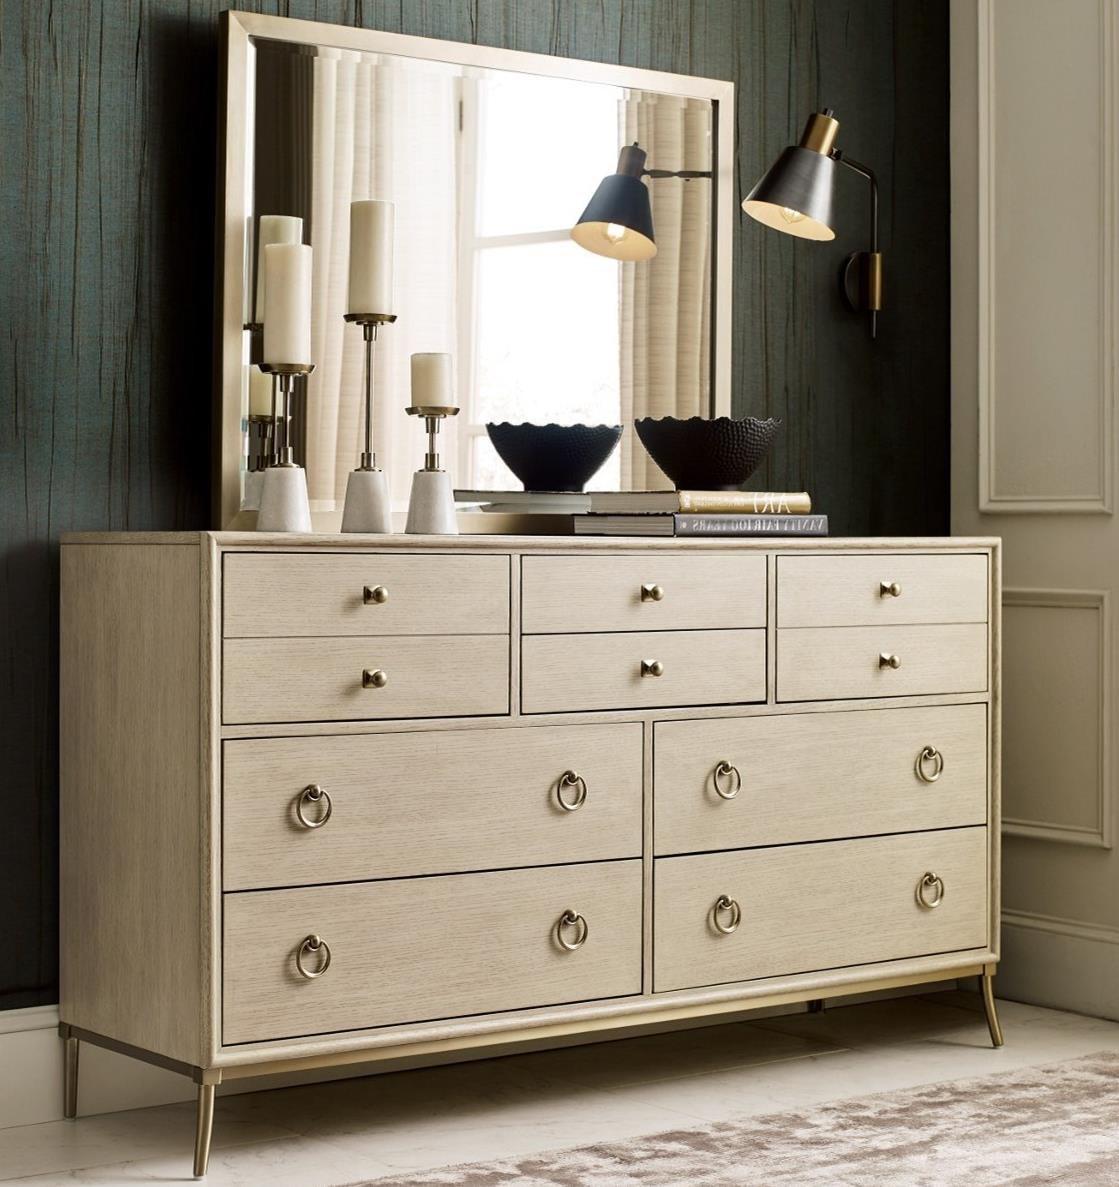 Lenox Dresser + Mirror Set by American Drew at Johnny Janosik